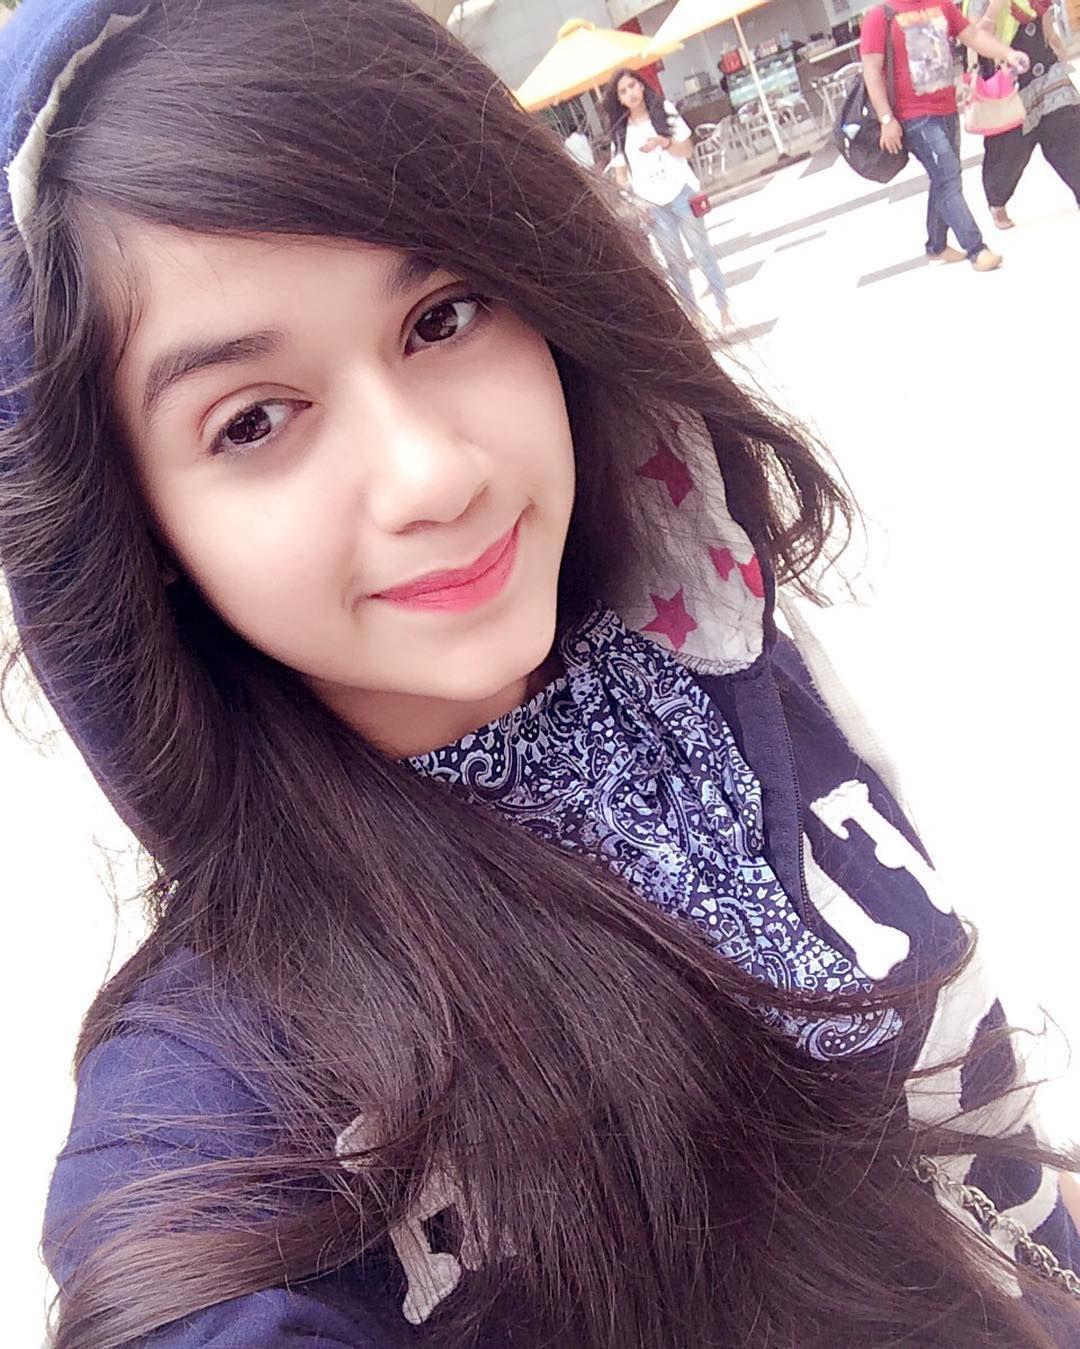 Jannat zubair pink dress  Pin by swag on Actresses  Pinterest  Beautiful Cute and Cute girls